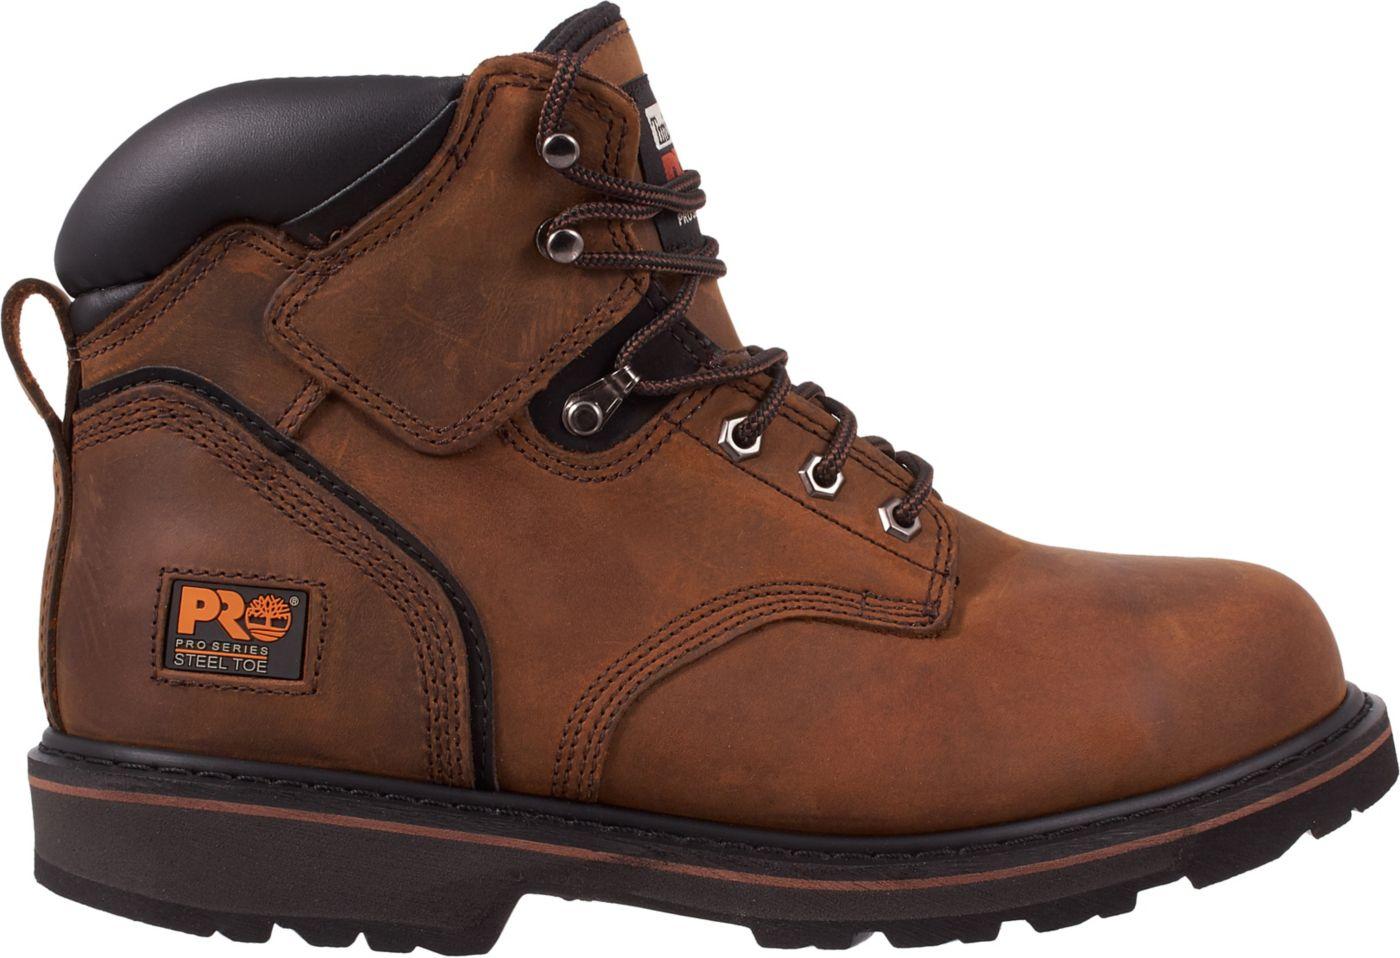 Timberland PRO Men's Pit Boss 6'' Steel Toe Work Boots